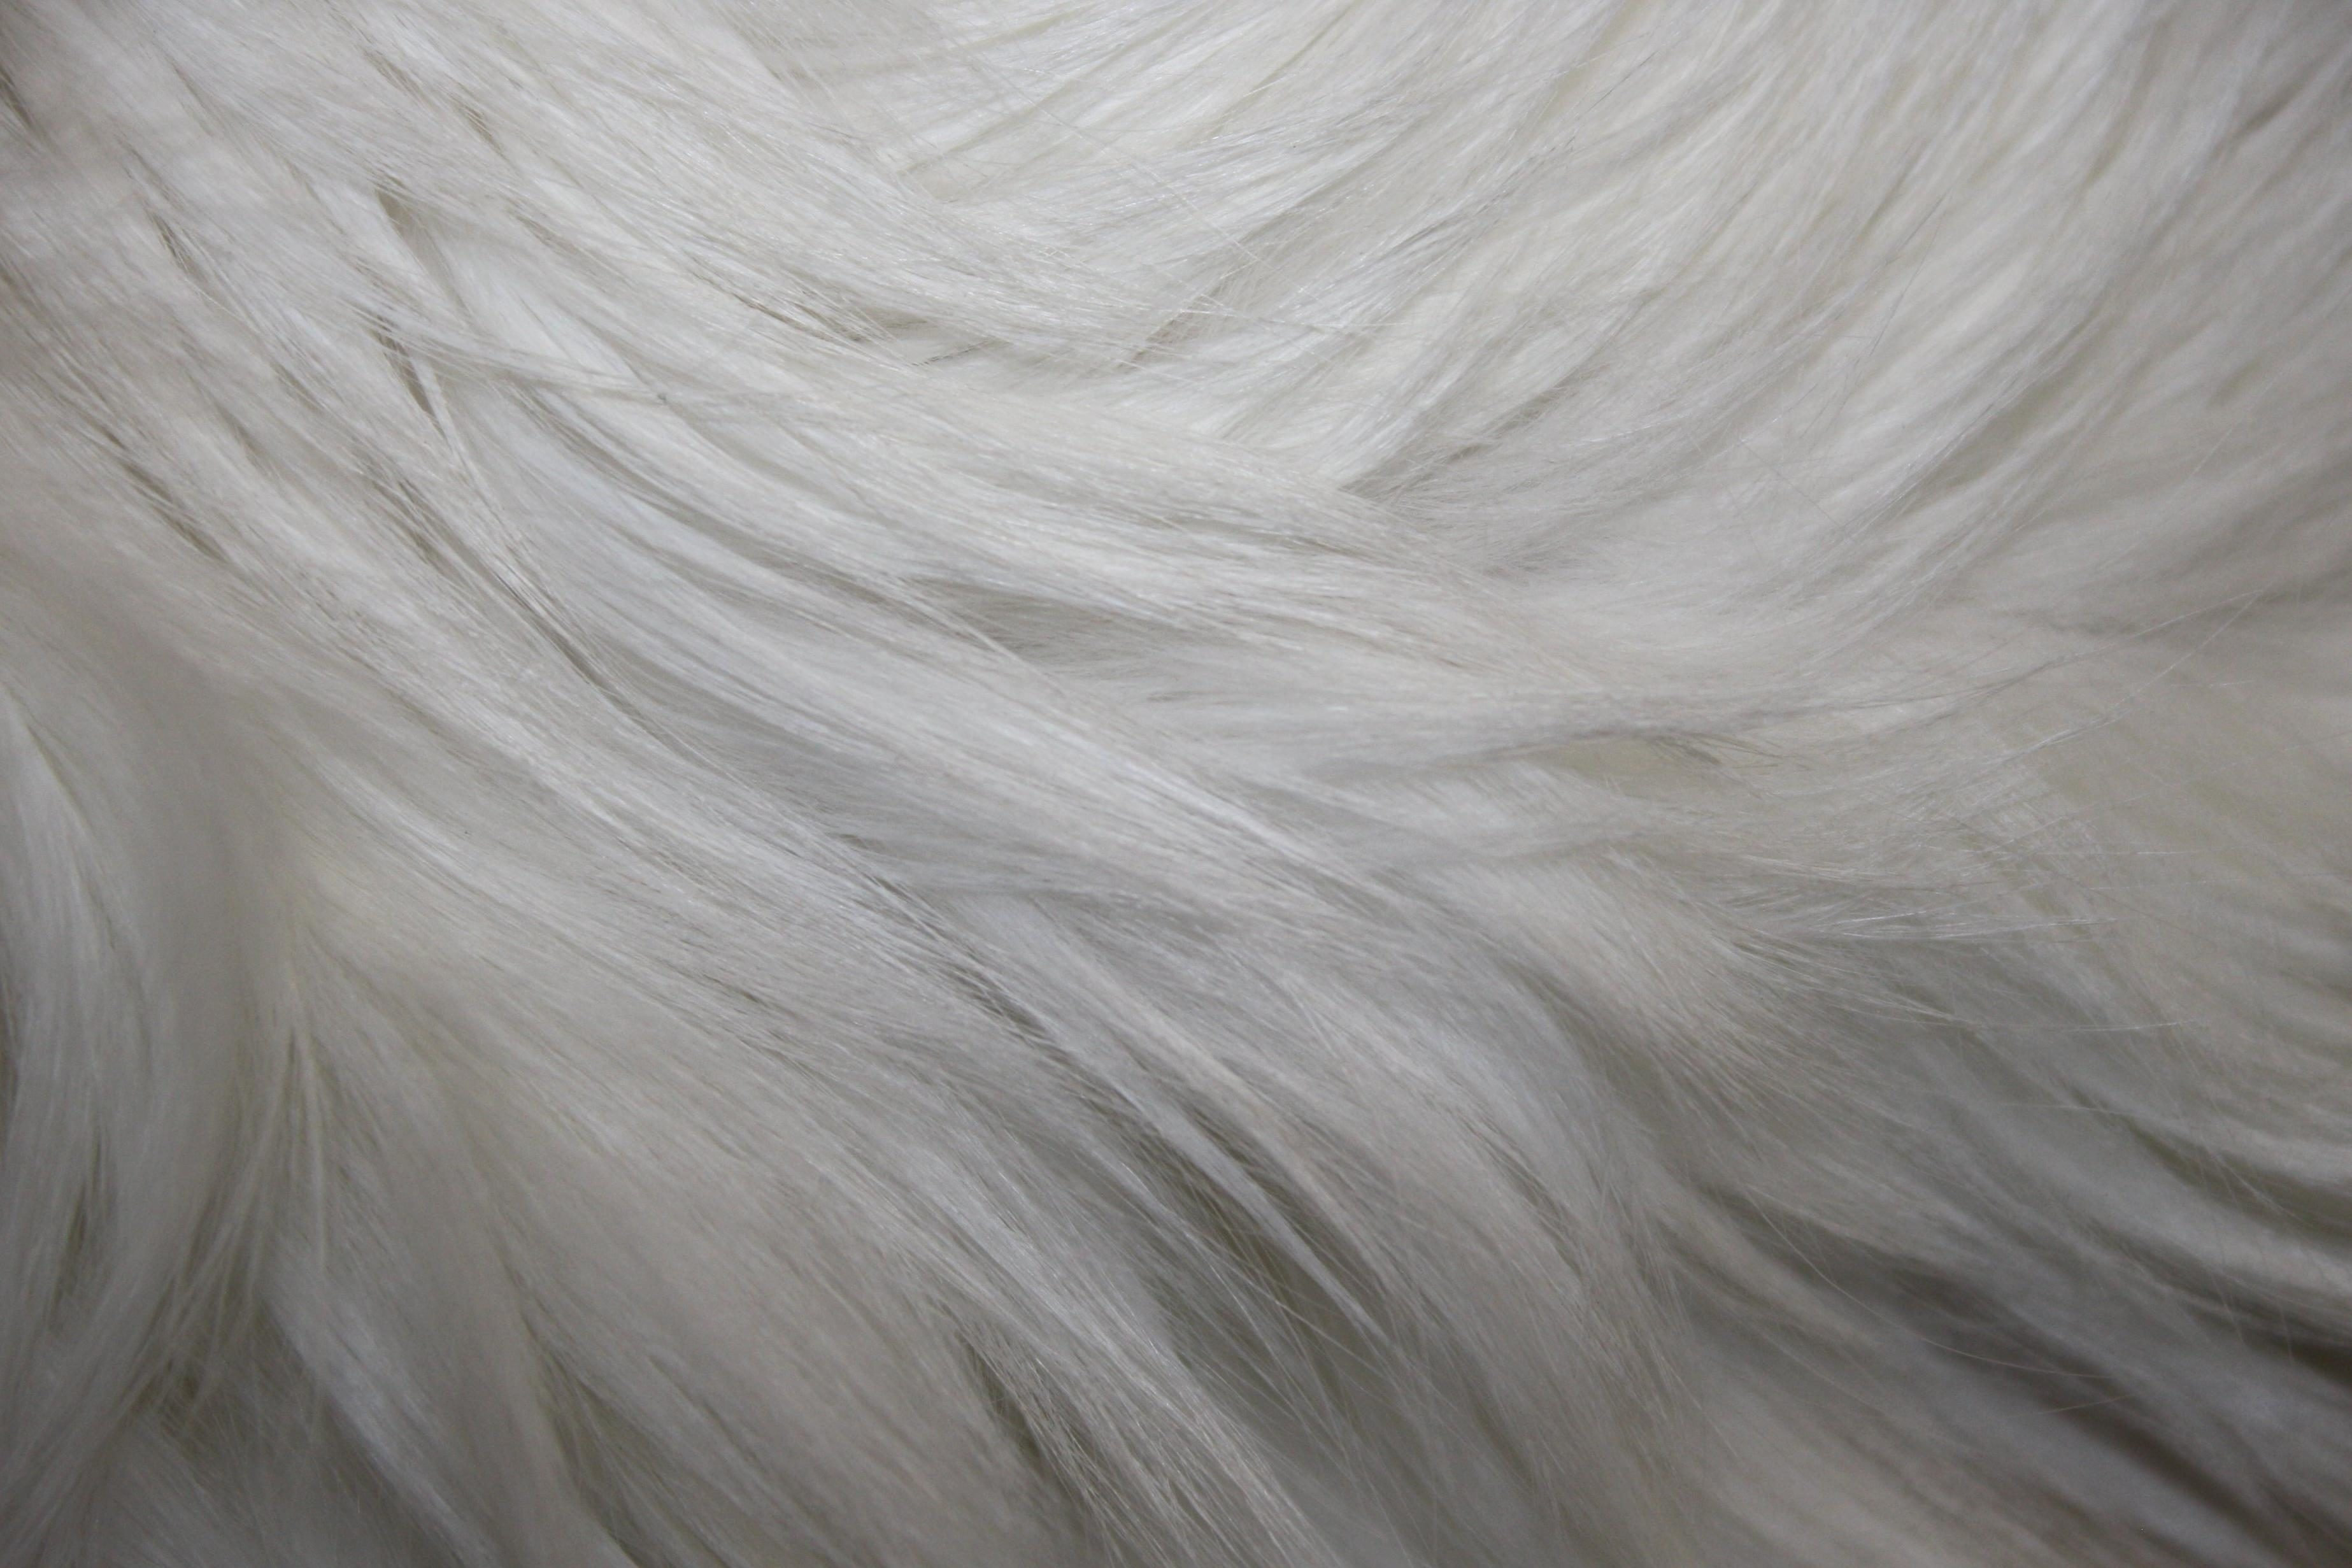 Black Cat Wallpaper Free Picture White Fur Texture